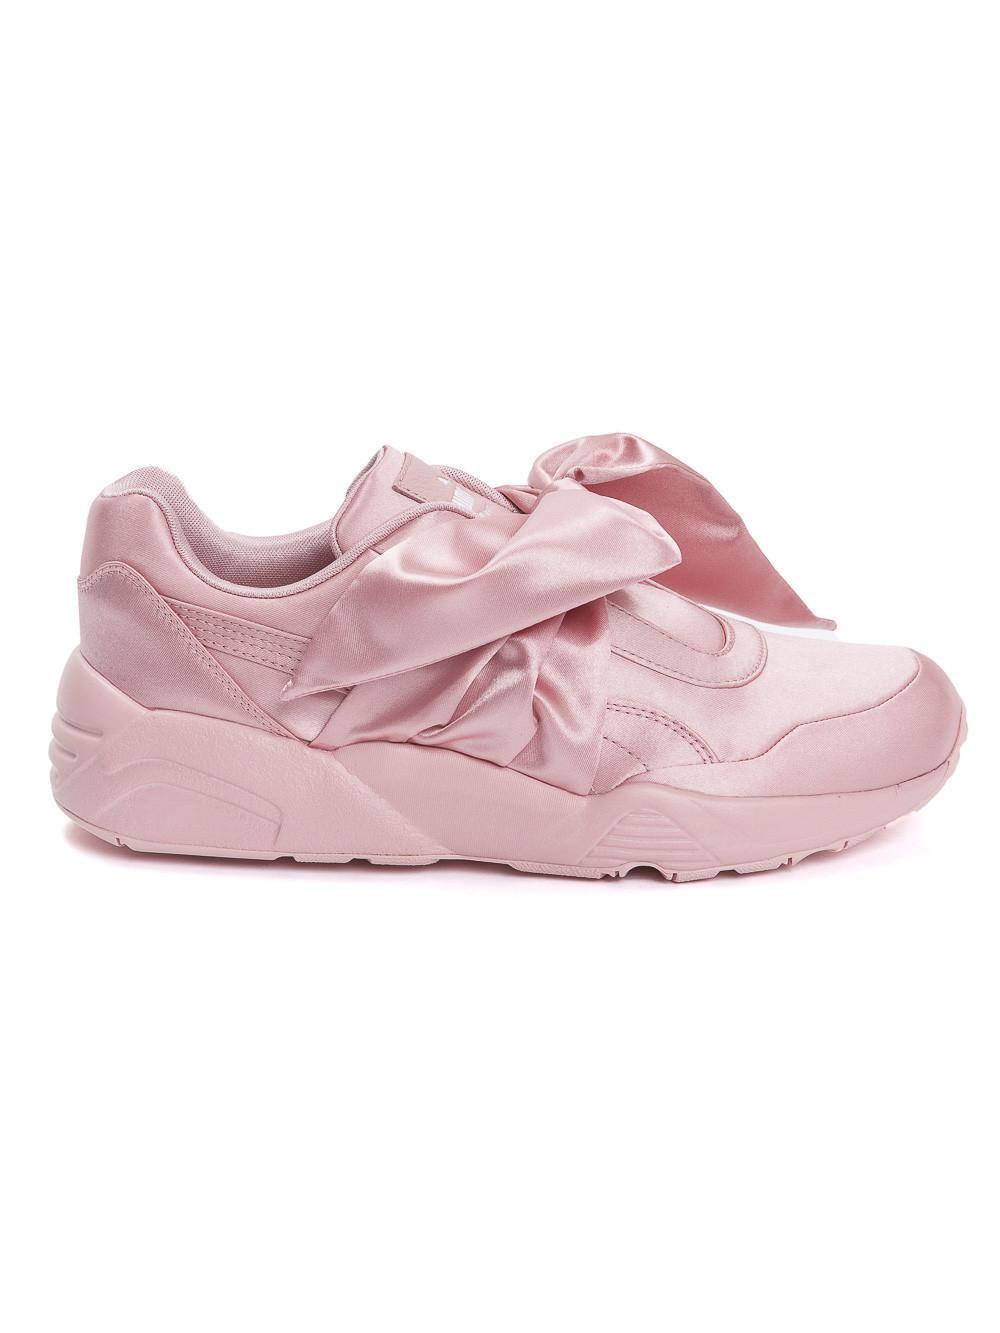 new product cf317 f5051 PUMA Pink Fenty X Rihanna Satin Bow Sneakers